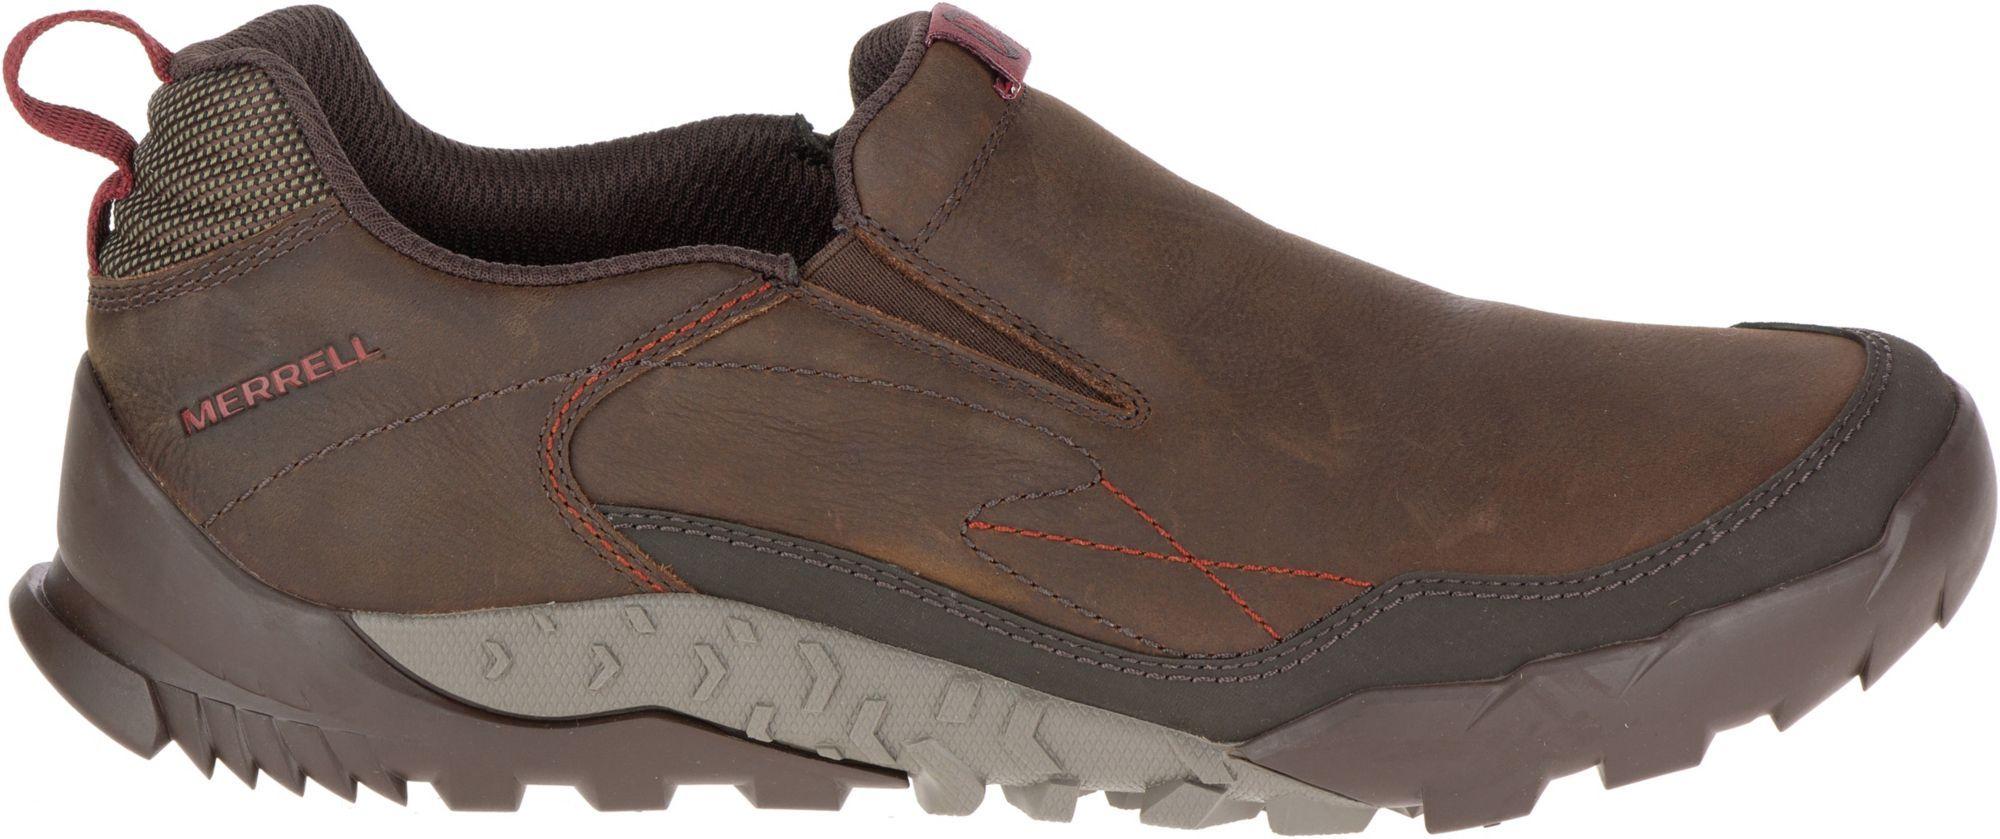 Men's Merrell Sandals | Best Price Guarantee at DICK'S